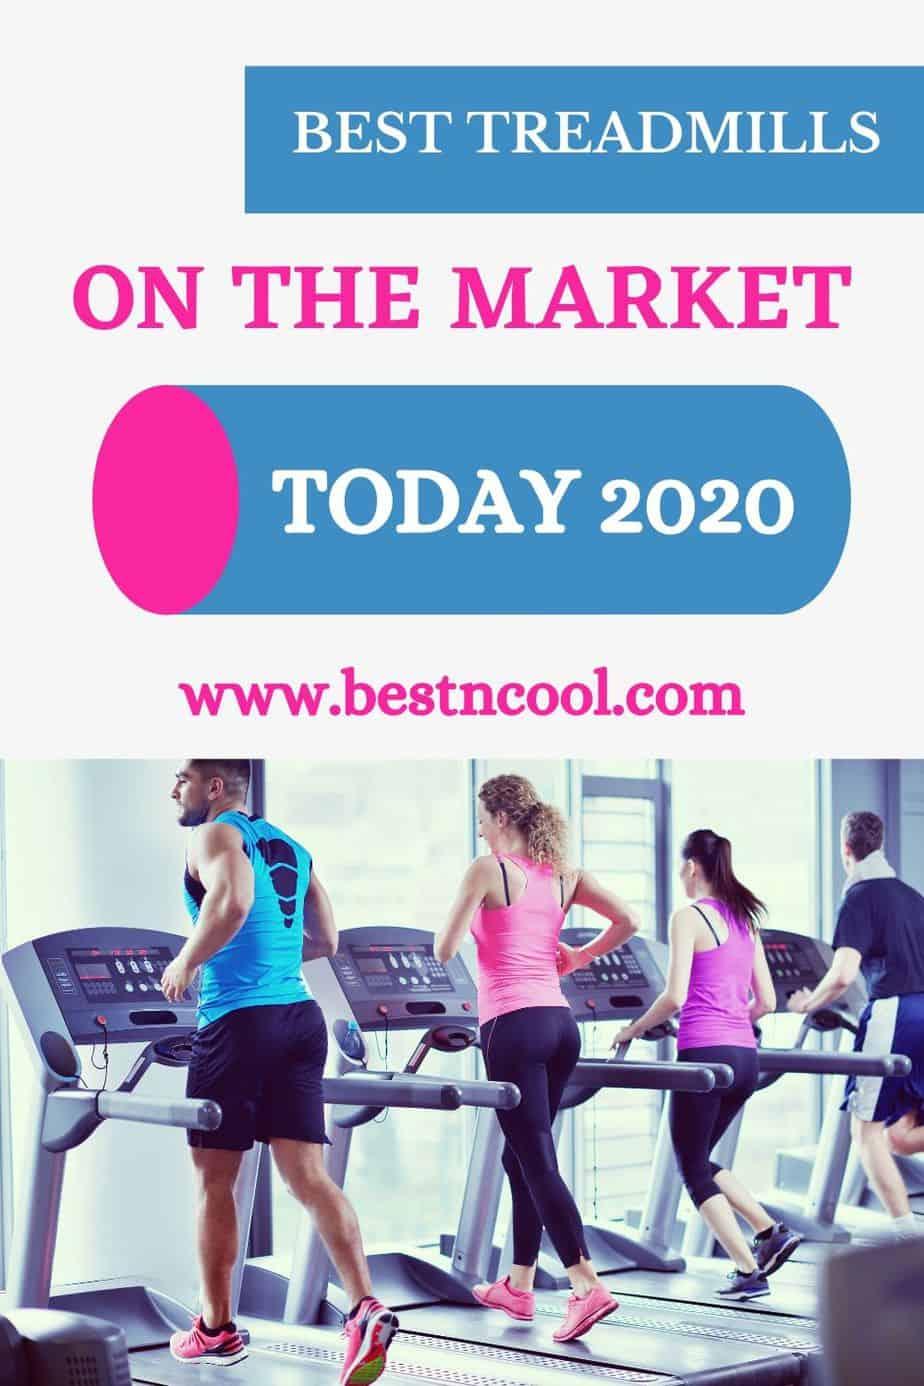 best treadmill 350 pound weight capacity